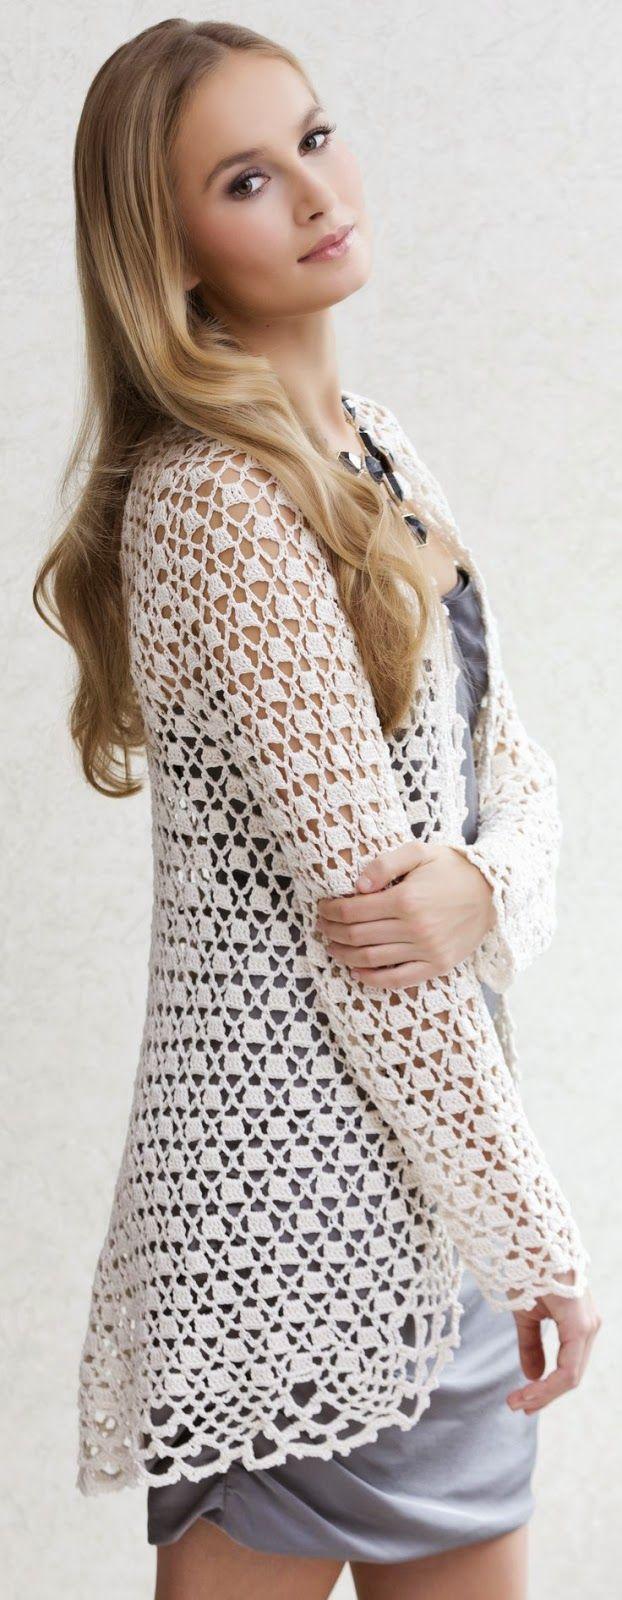 Crochetemoda: Casacos                                                       …